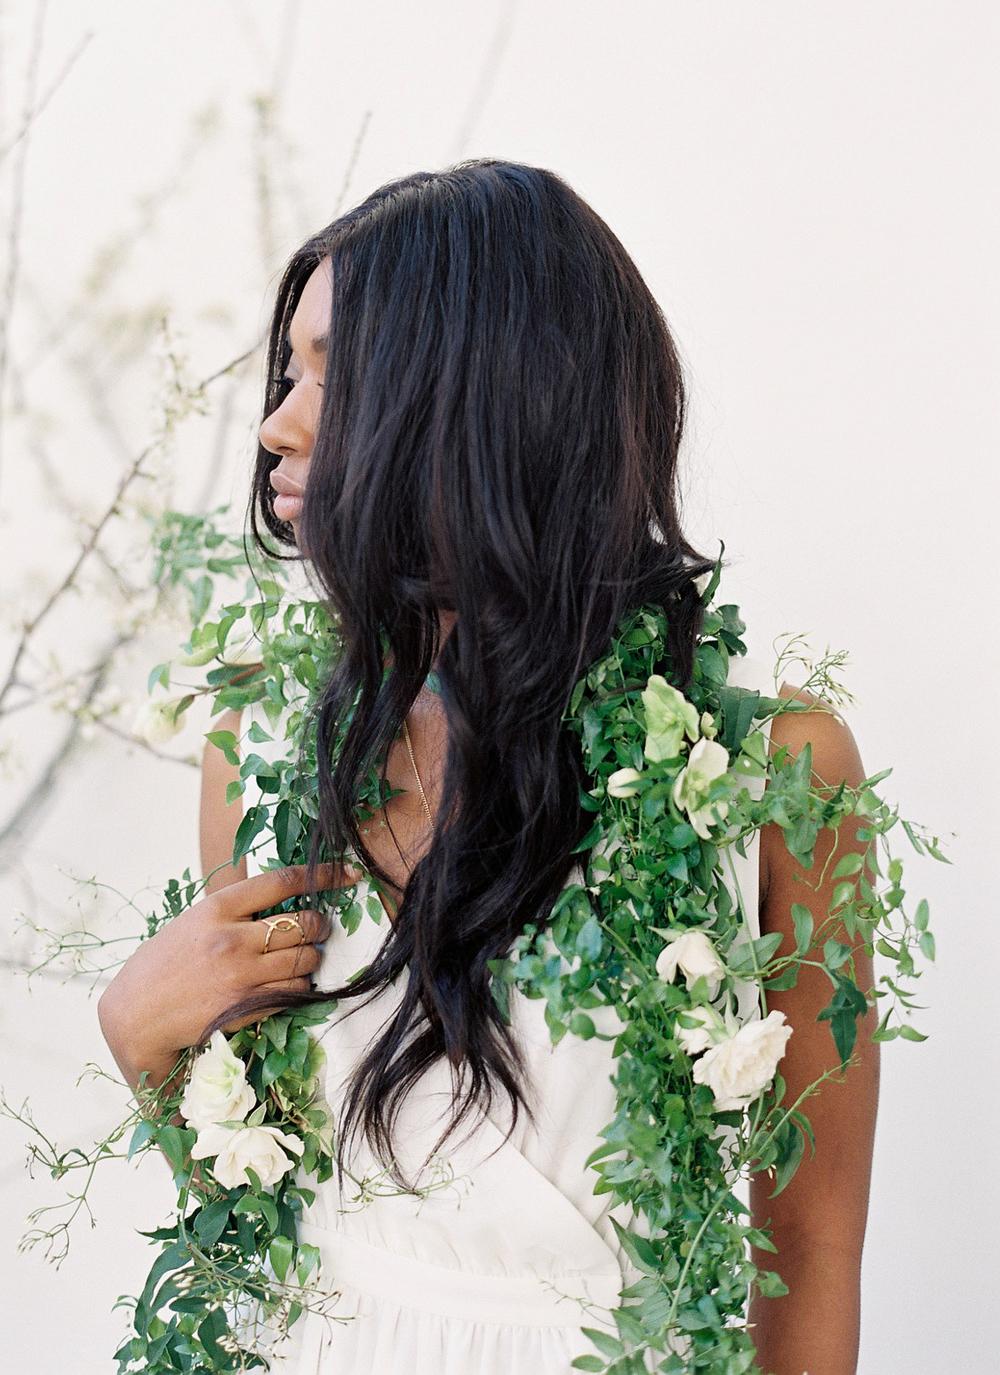 Floralessence-Esmeraldafranco-6.JPG